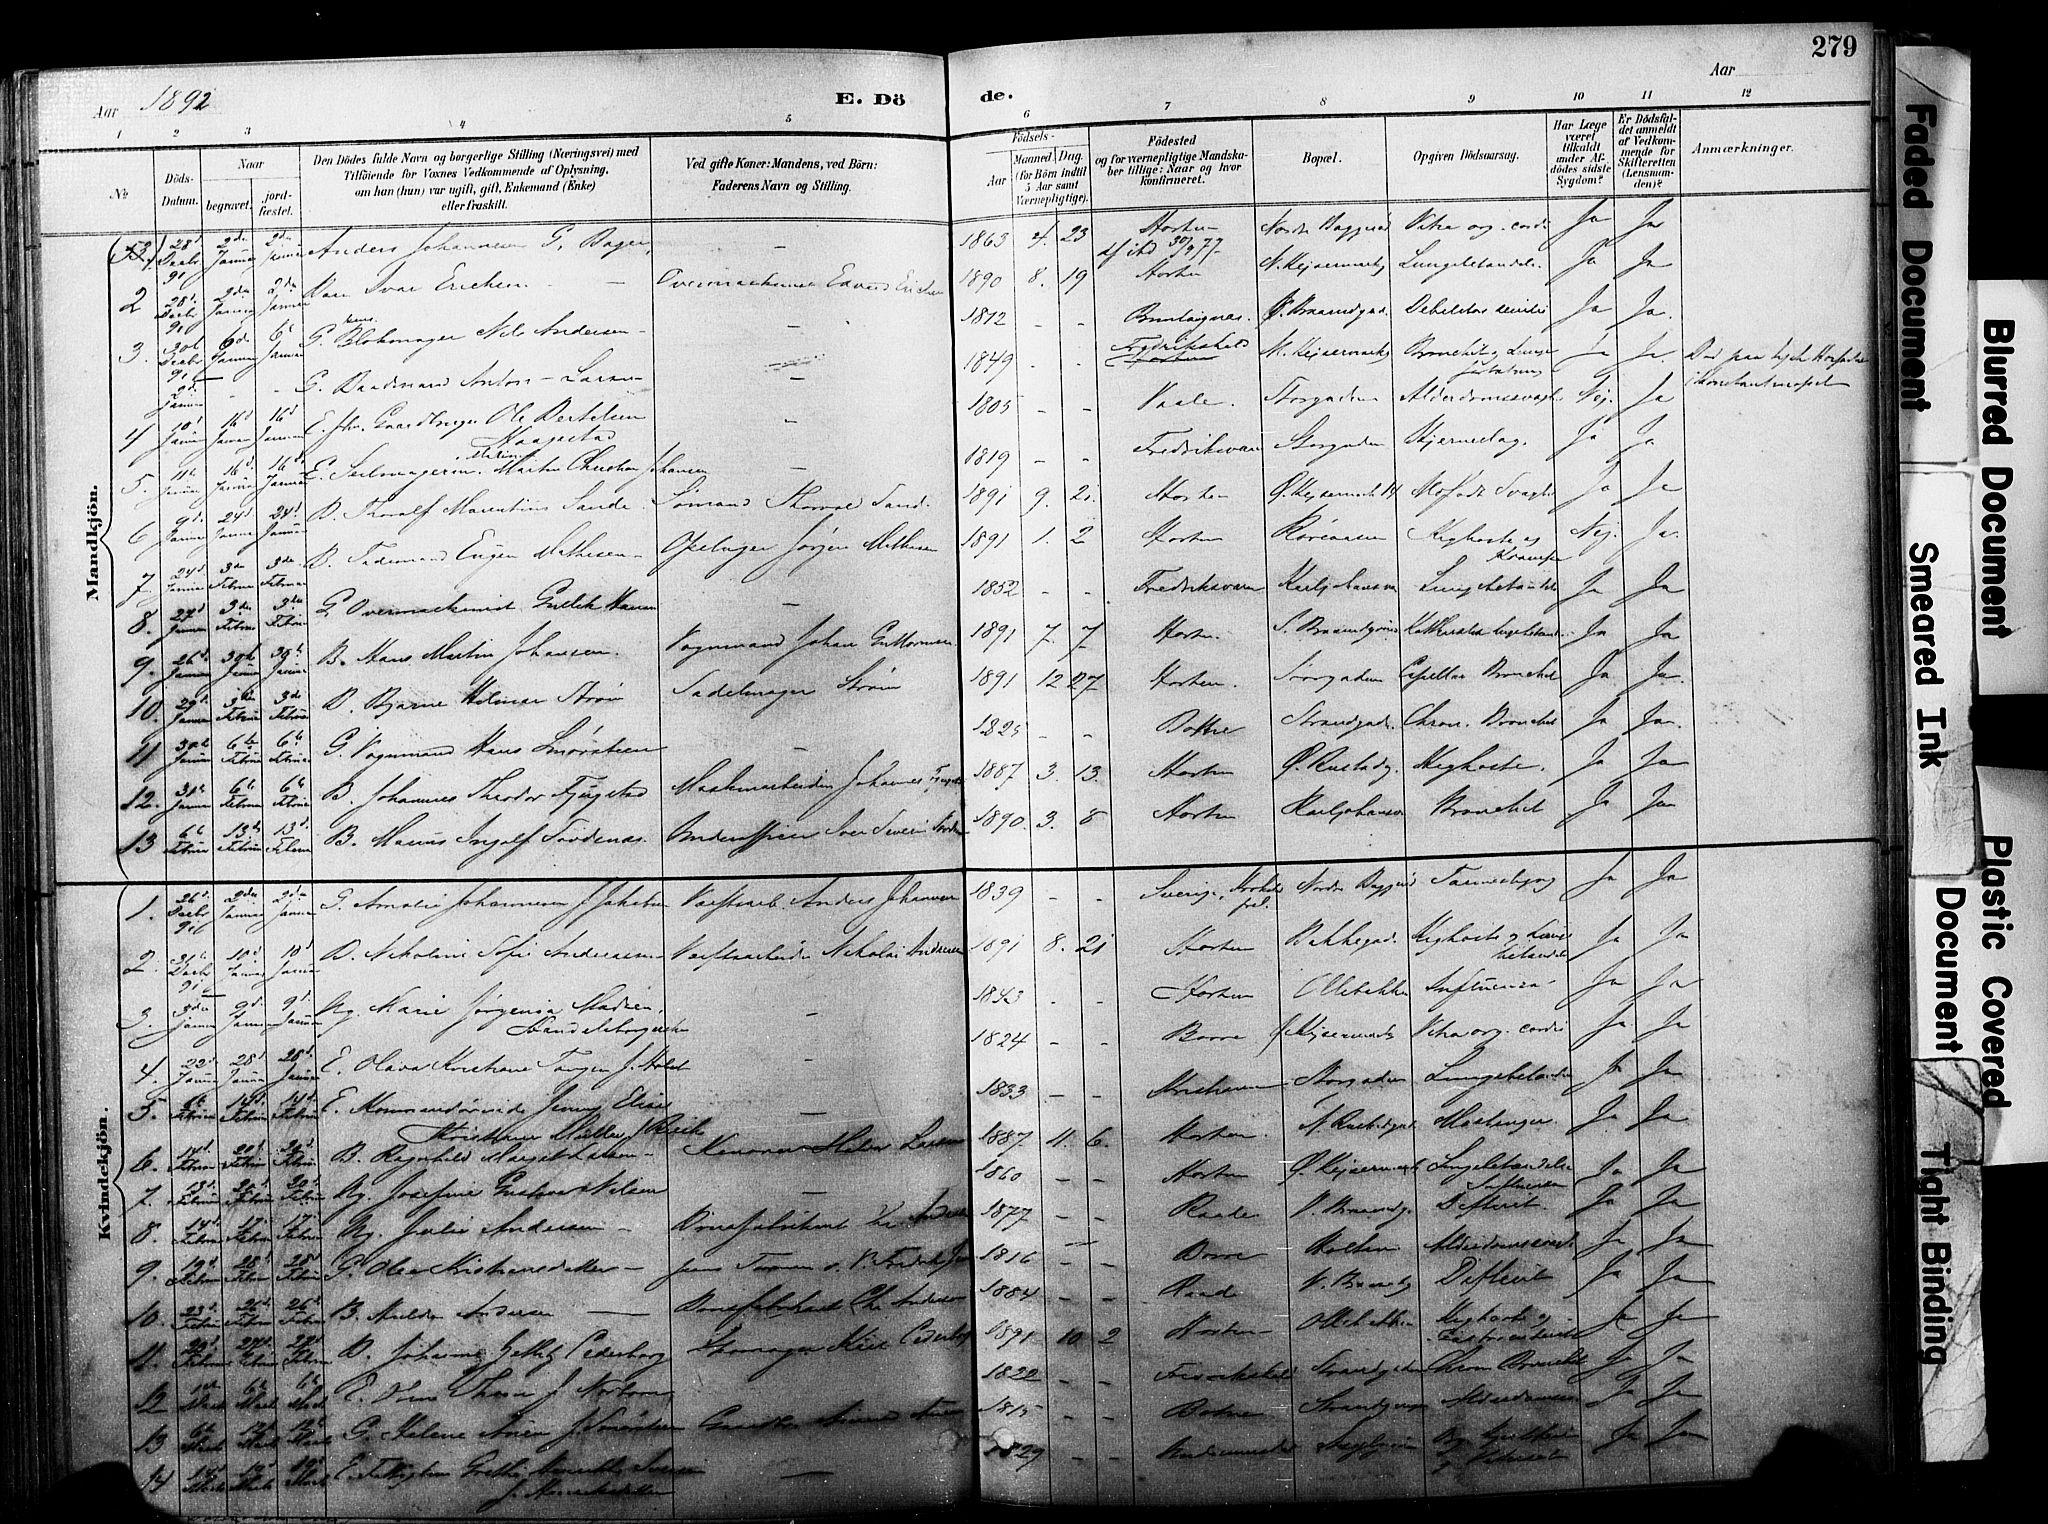 SAKO, Horten kirkebøker, F/Fa/L0004: Parish register (official) no. 4, 1888-1895, p. 279